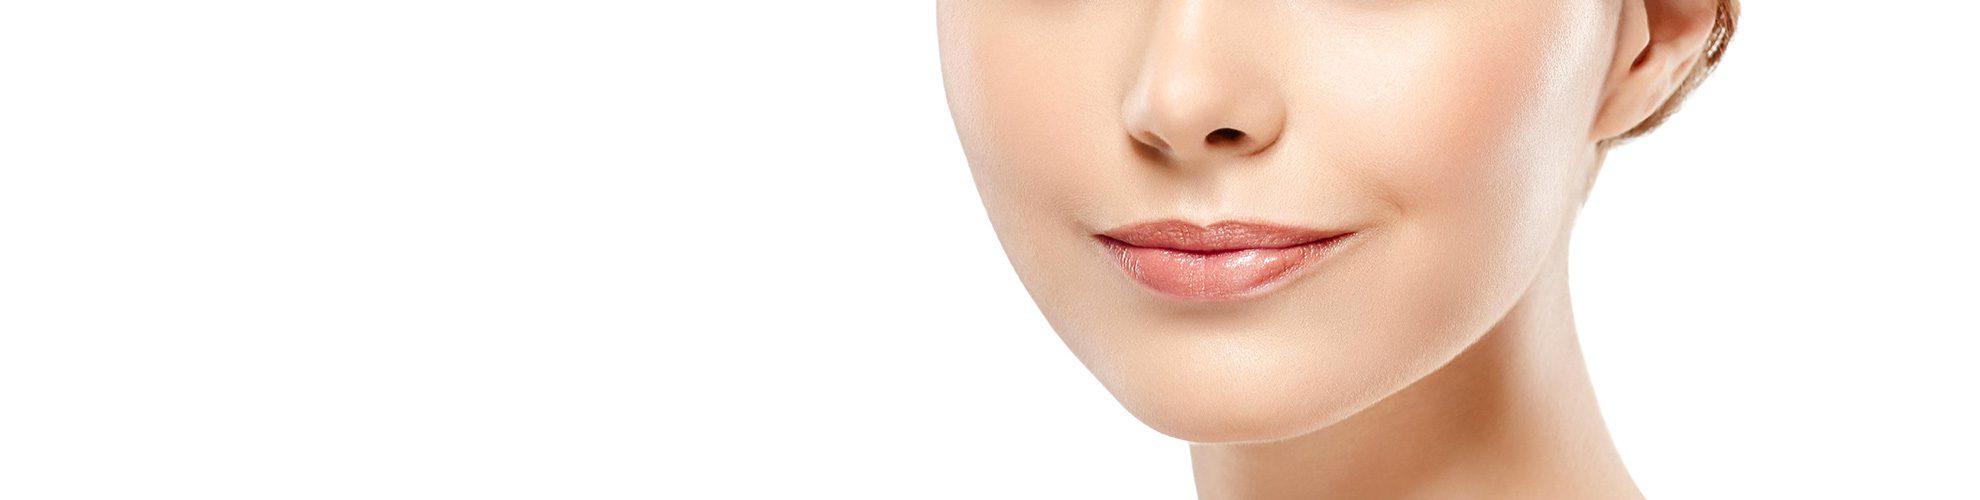 Chin Augmentation & Reduction (Implants & Genioplasty